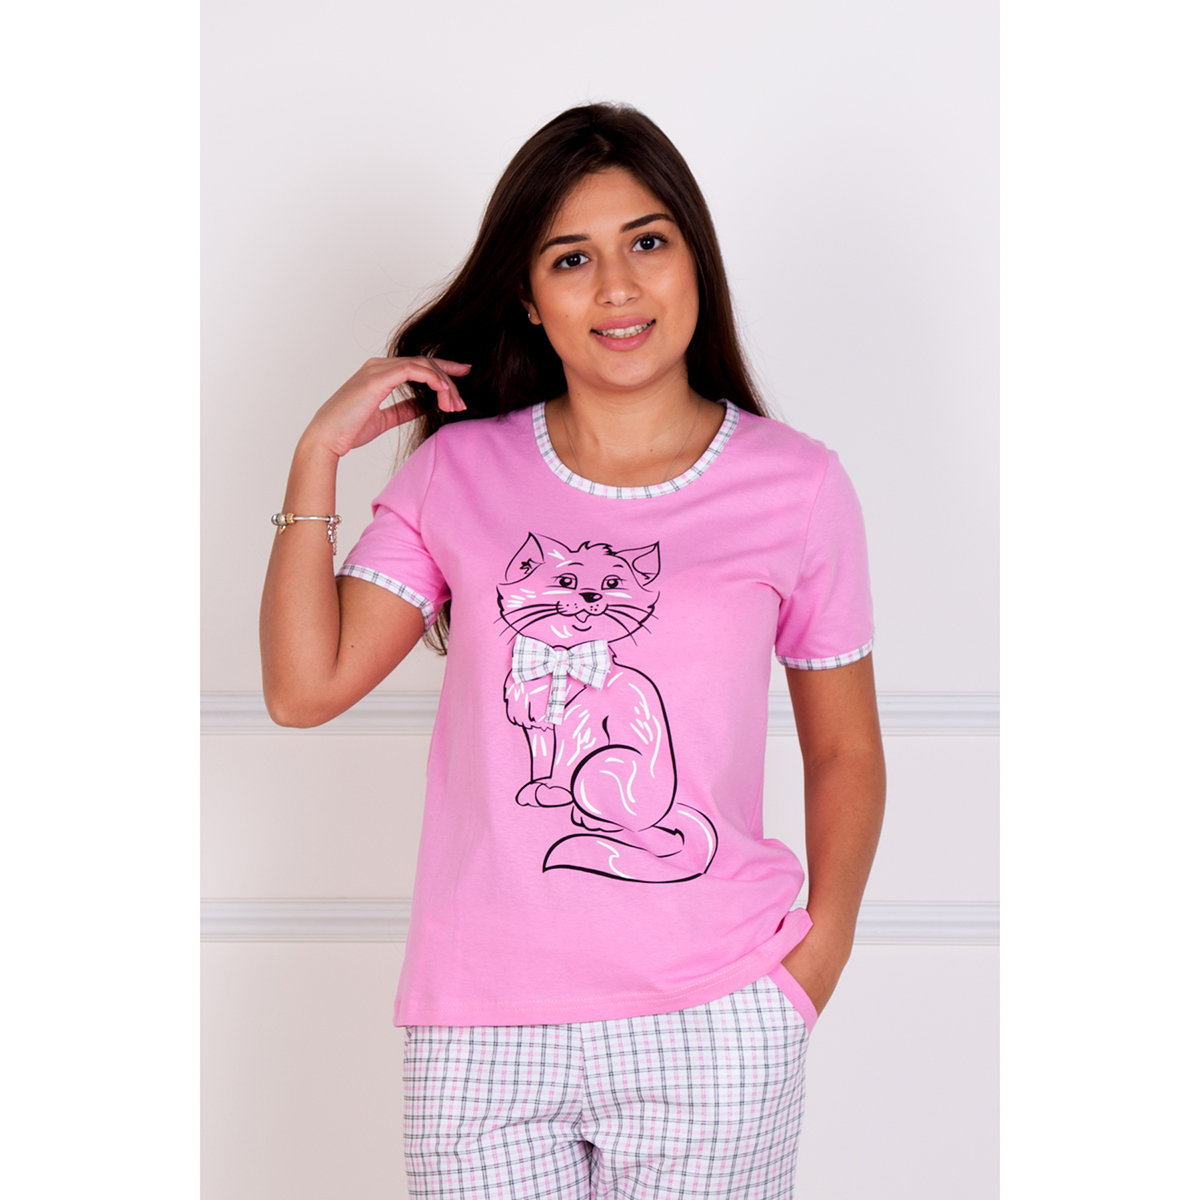 Женский пижама Киска Розовый, размер 52Пижамы<br>Обхват груди: 104 см <br>Обхват талии: 85 см <br>Обхват бедер: 112 см <br>Рост: 167 см<br><br>Тип: Жен. костюм<br>Размер: 52<br>Материал: Кулирка